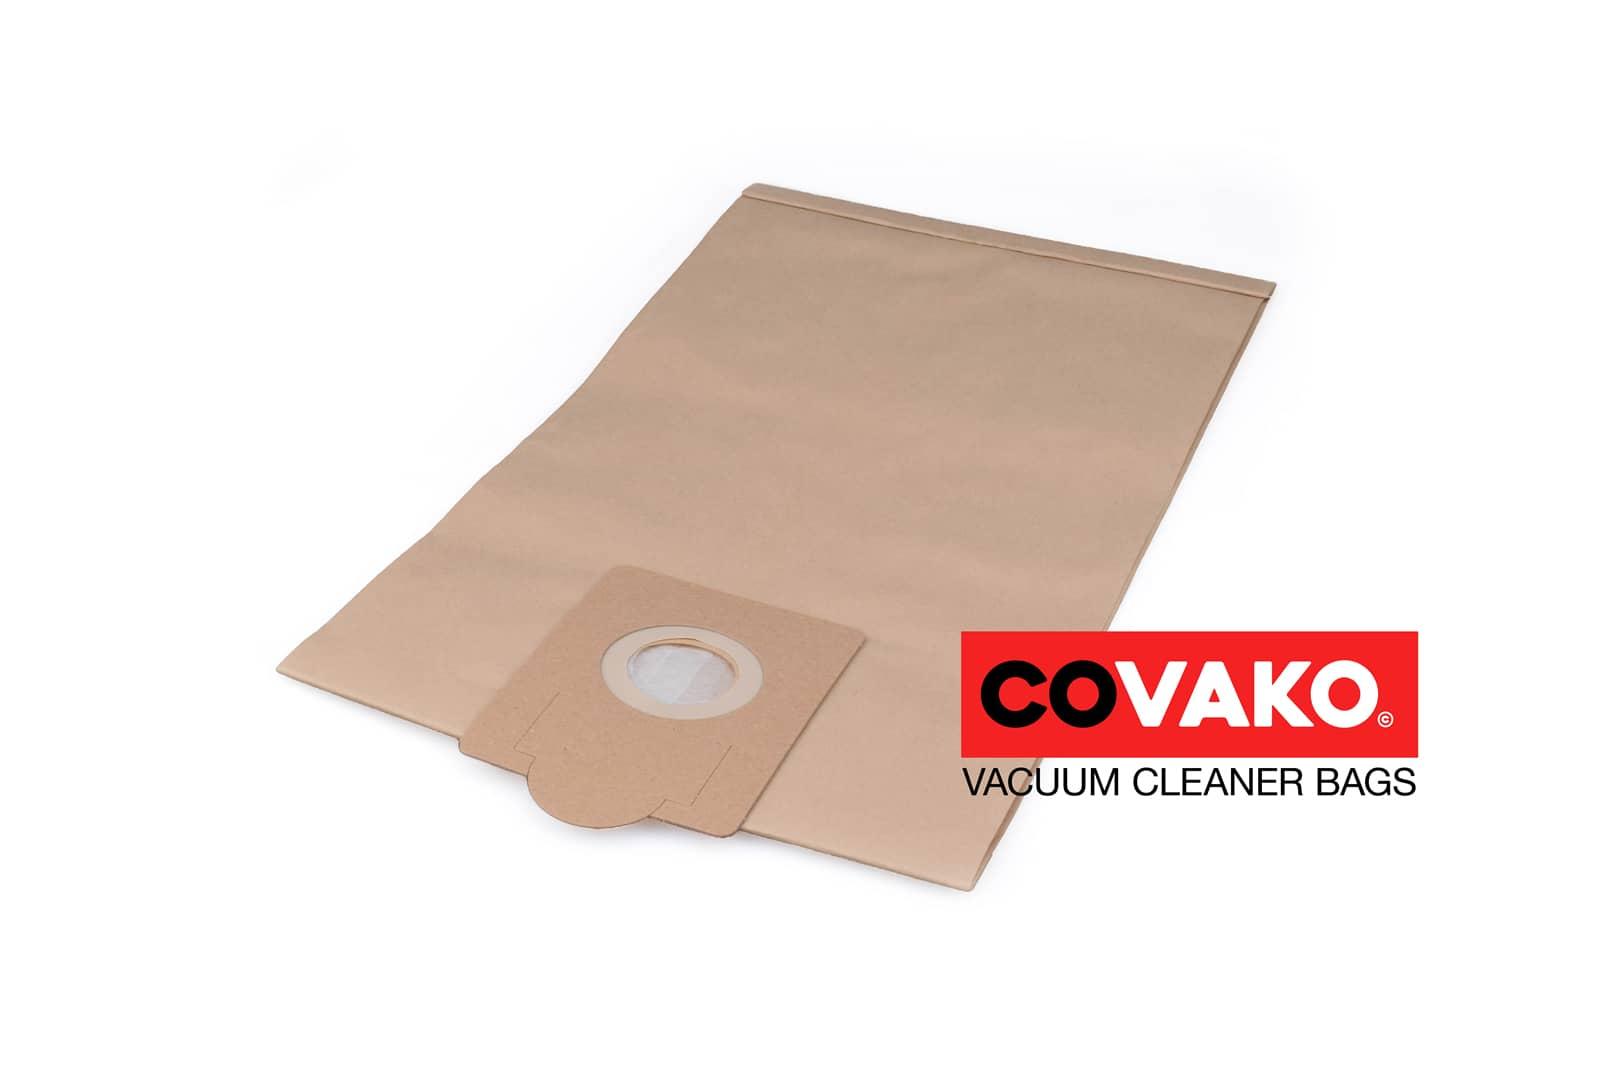 Hevo HW 251 / Papier - Hevo sacs d'aspirateur